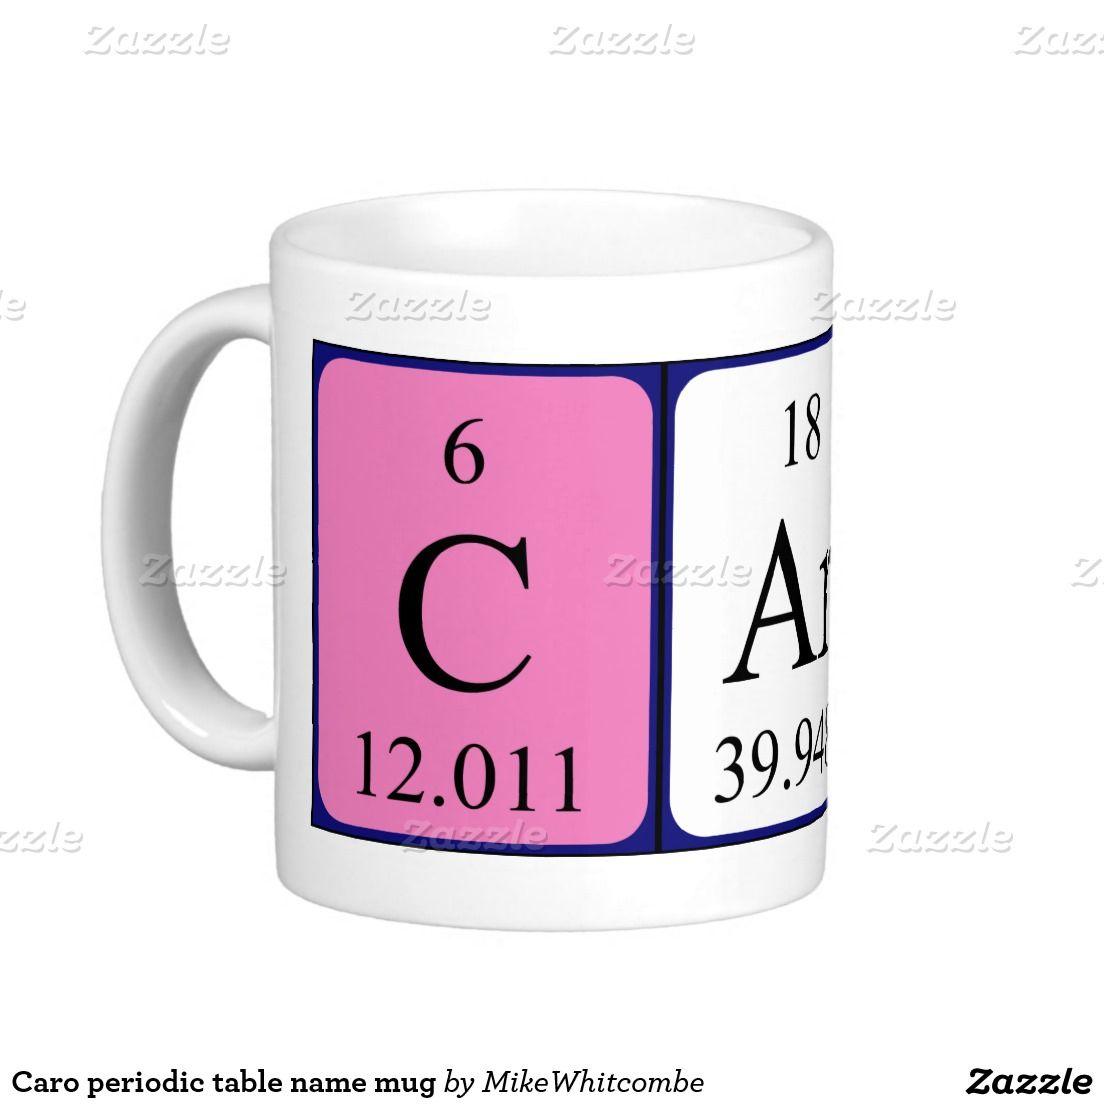 Caro periodic table name mug periodic table caro periodic table name mug urtaz Image collections